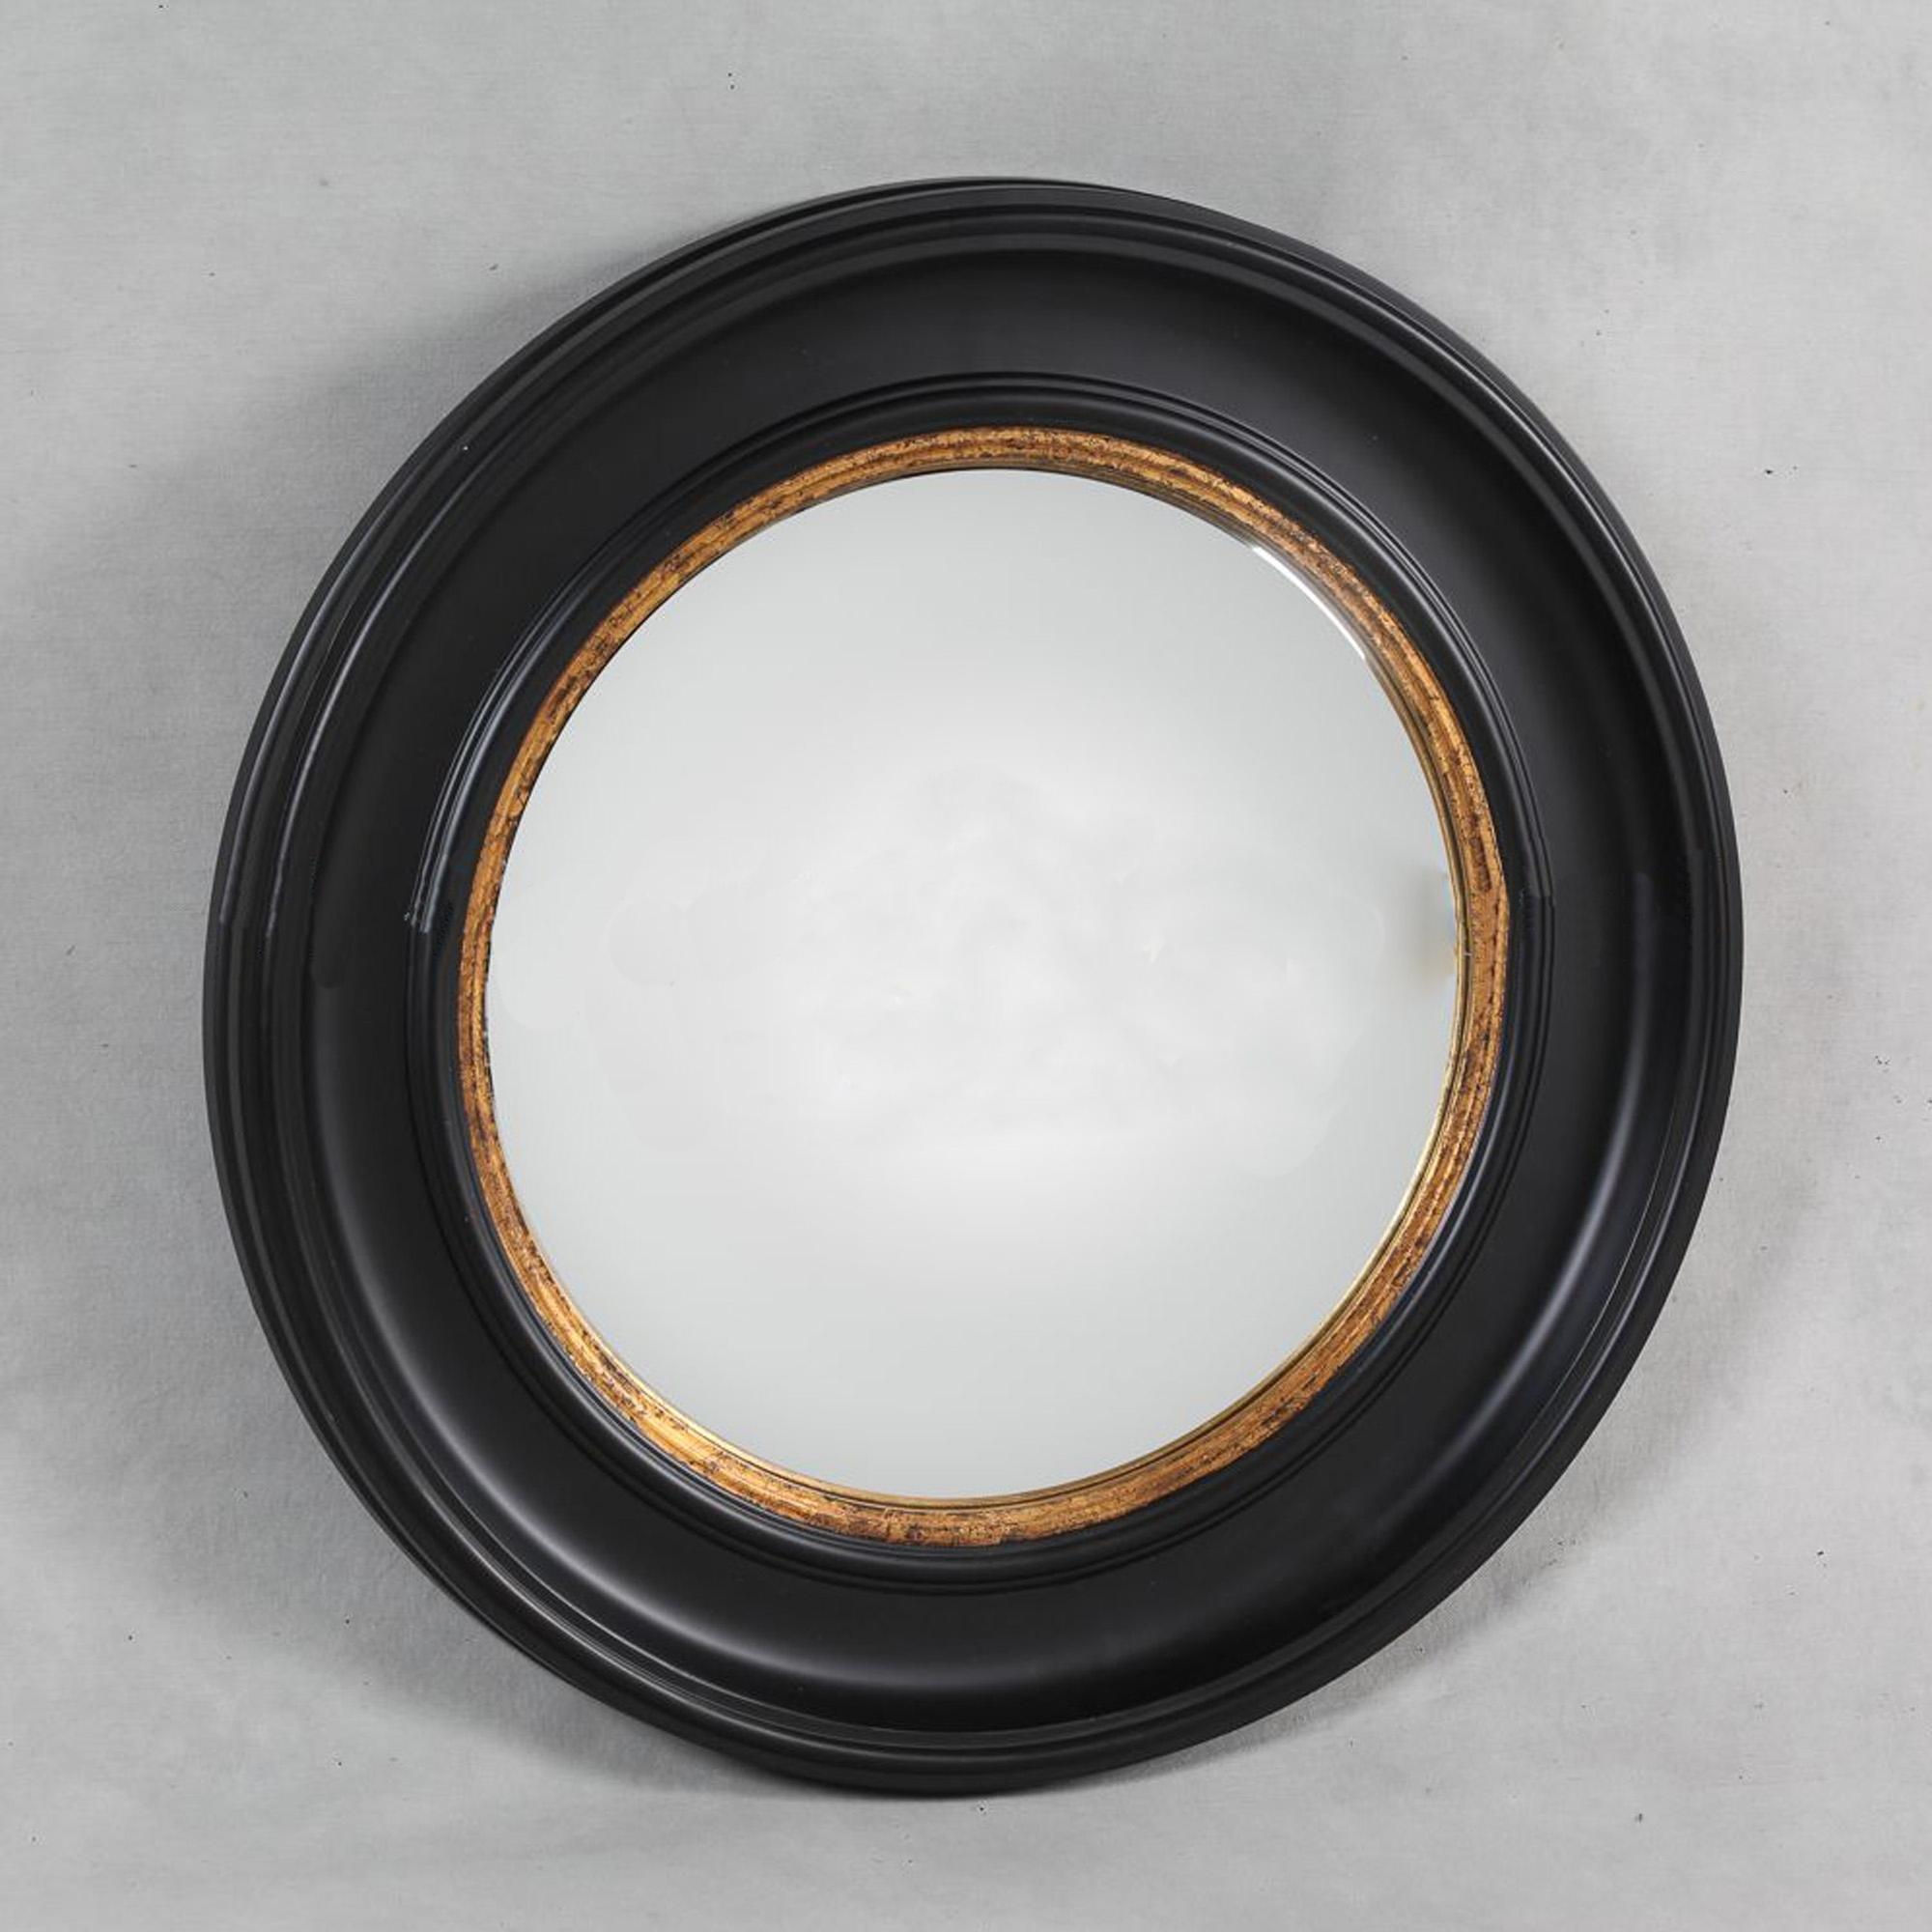 Deep Black Framed Convex Mirror Decorative Coloured Mirrors